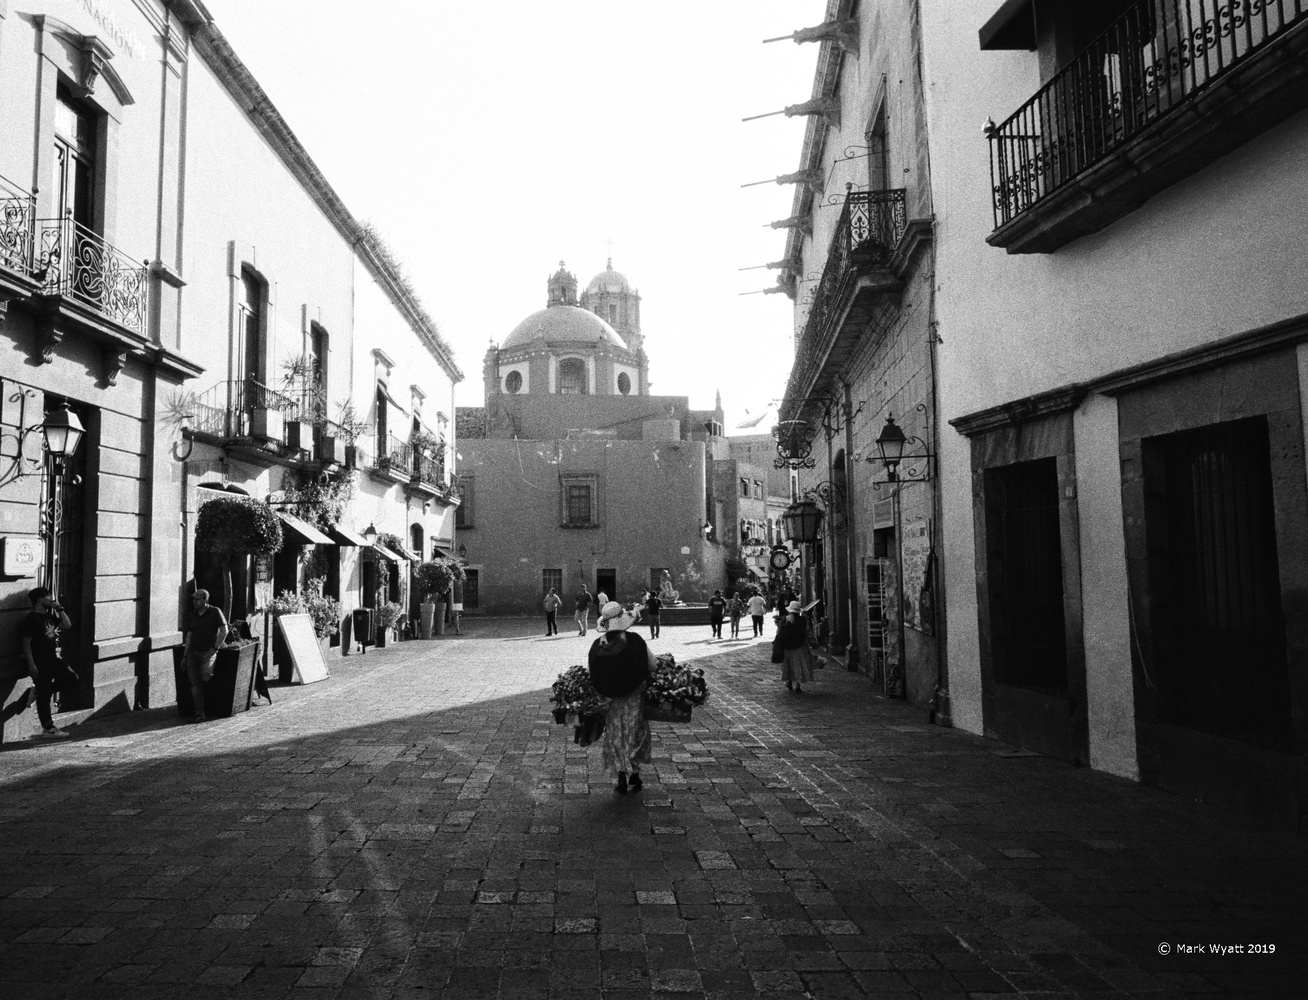 Mexico Street Scene by Mark Wyatt